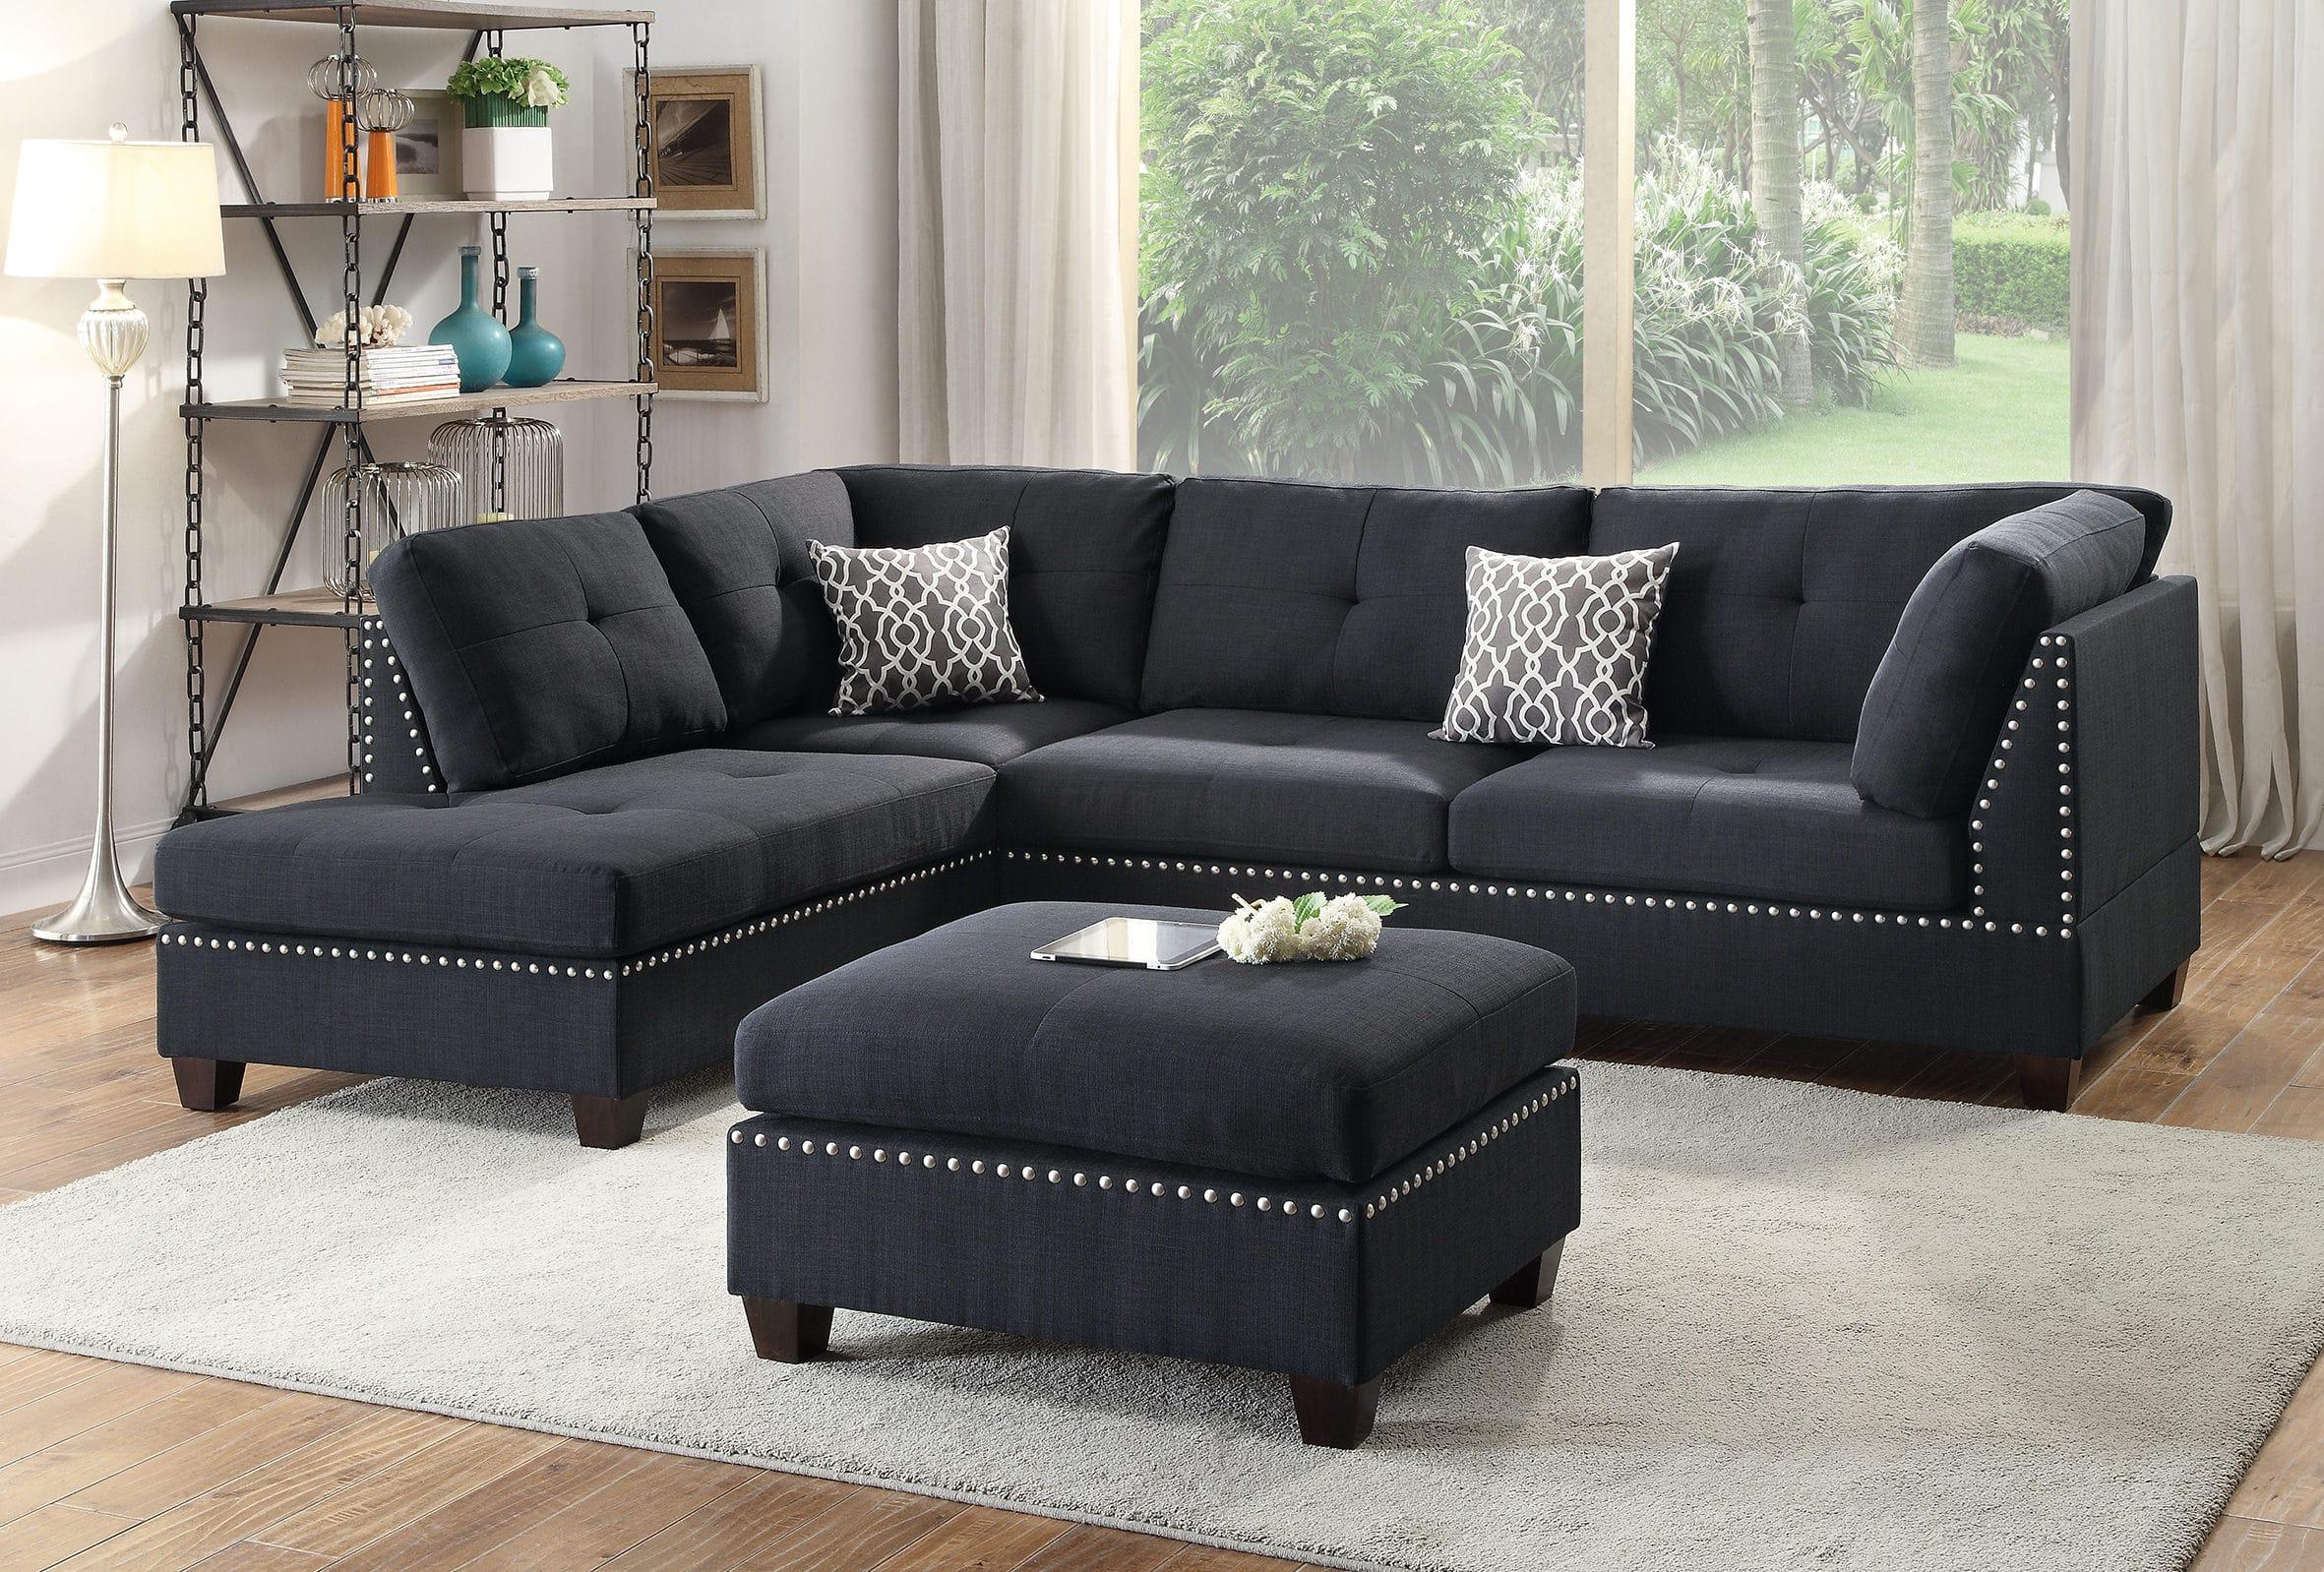 Swell F6974 Black 3 Pcs Sectional Sofa Set By Poundex Creativecarmelina Interior Chair Design Creativecarmelinacom